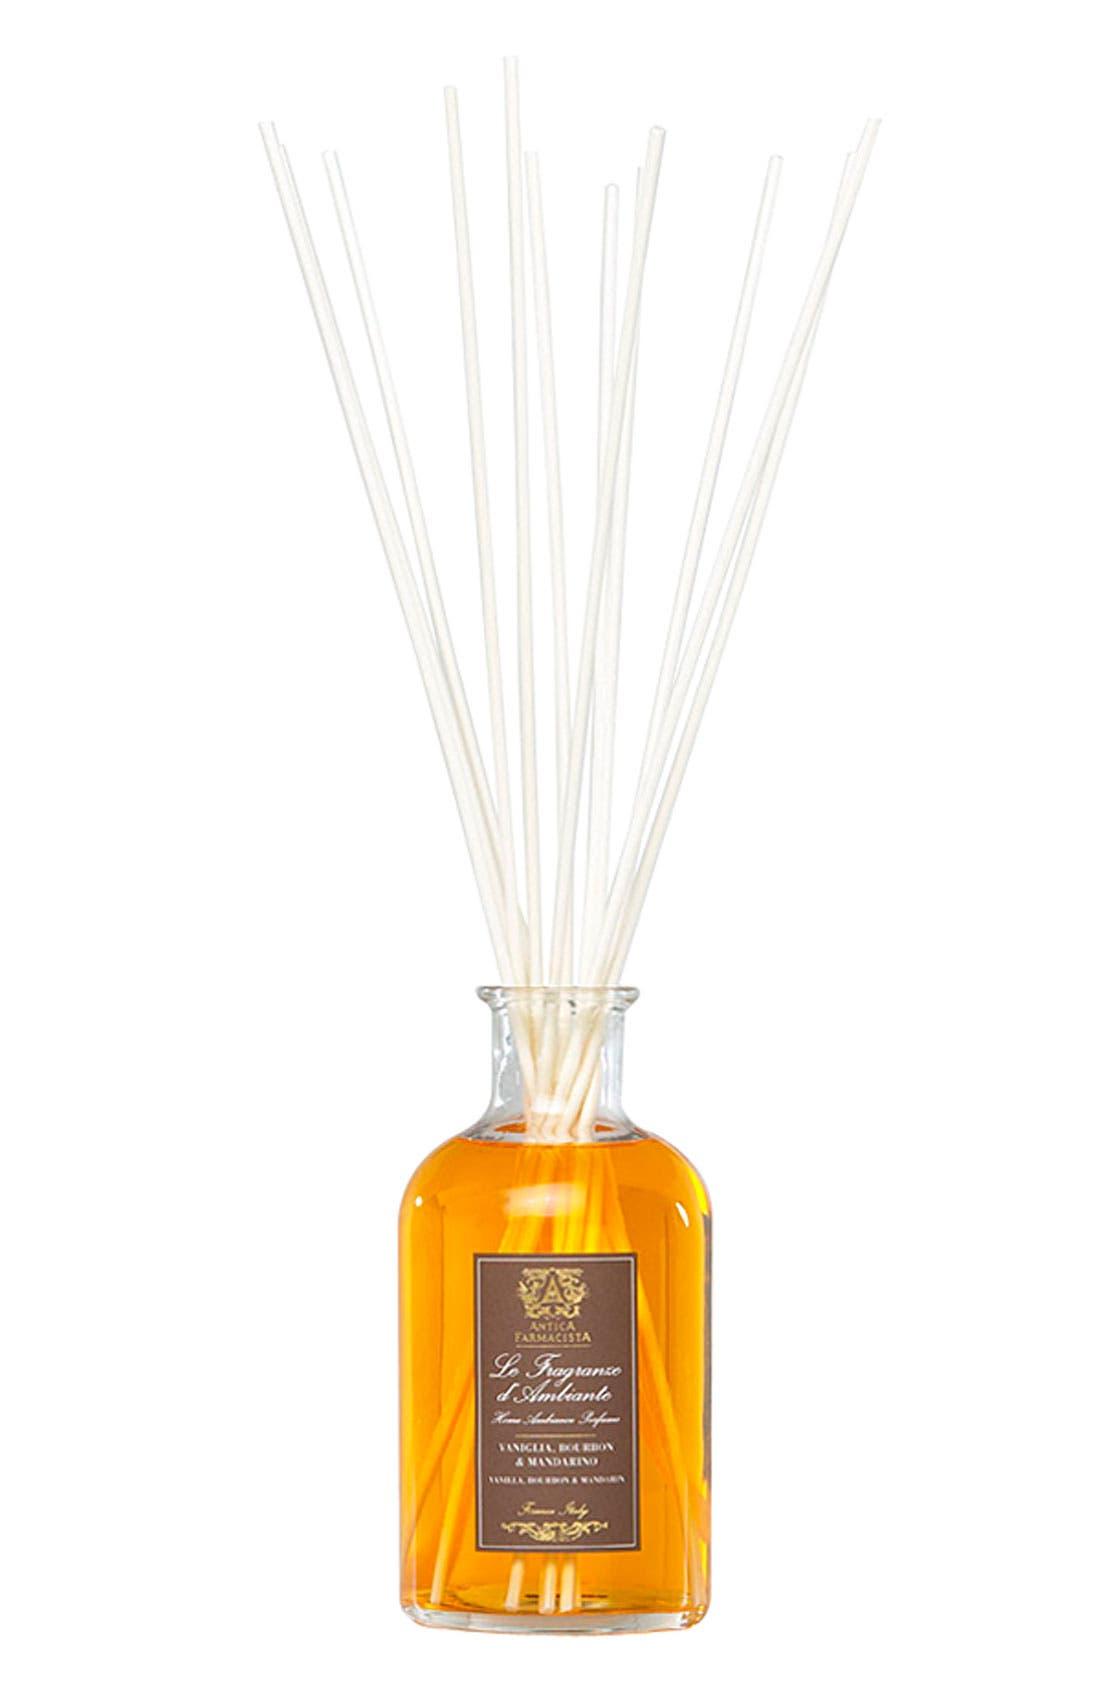 Antica Farmacista 'Vanilla, Bourbon & Mandarin' Home Ambiance Perfume